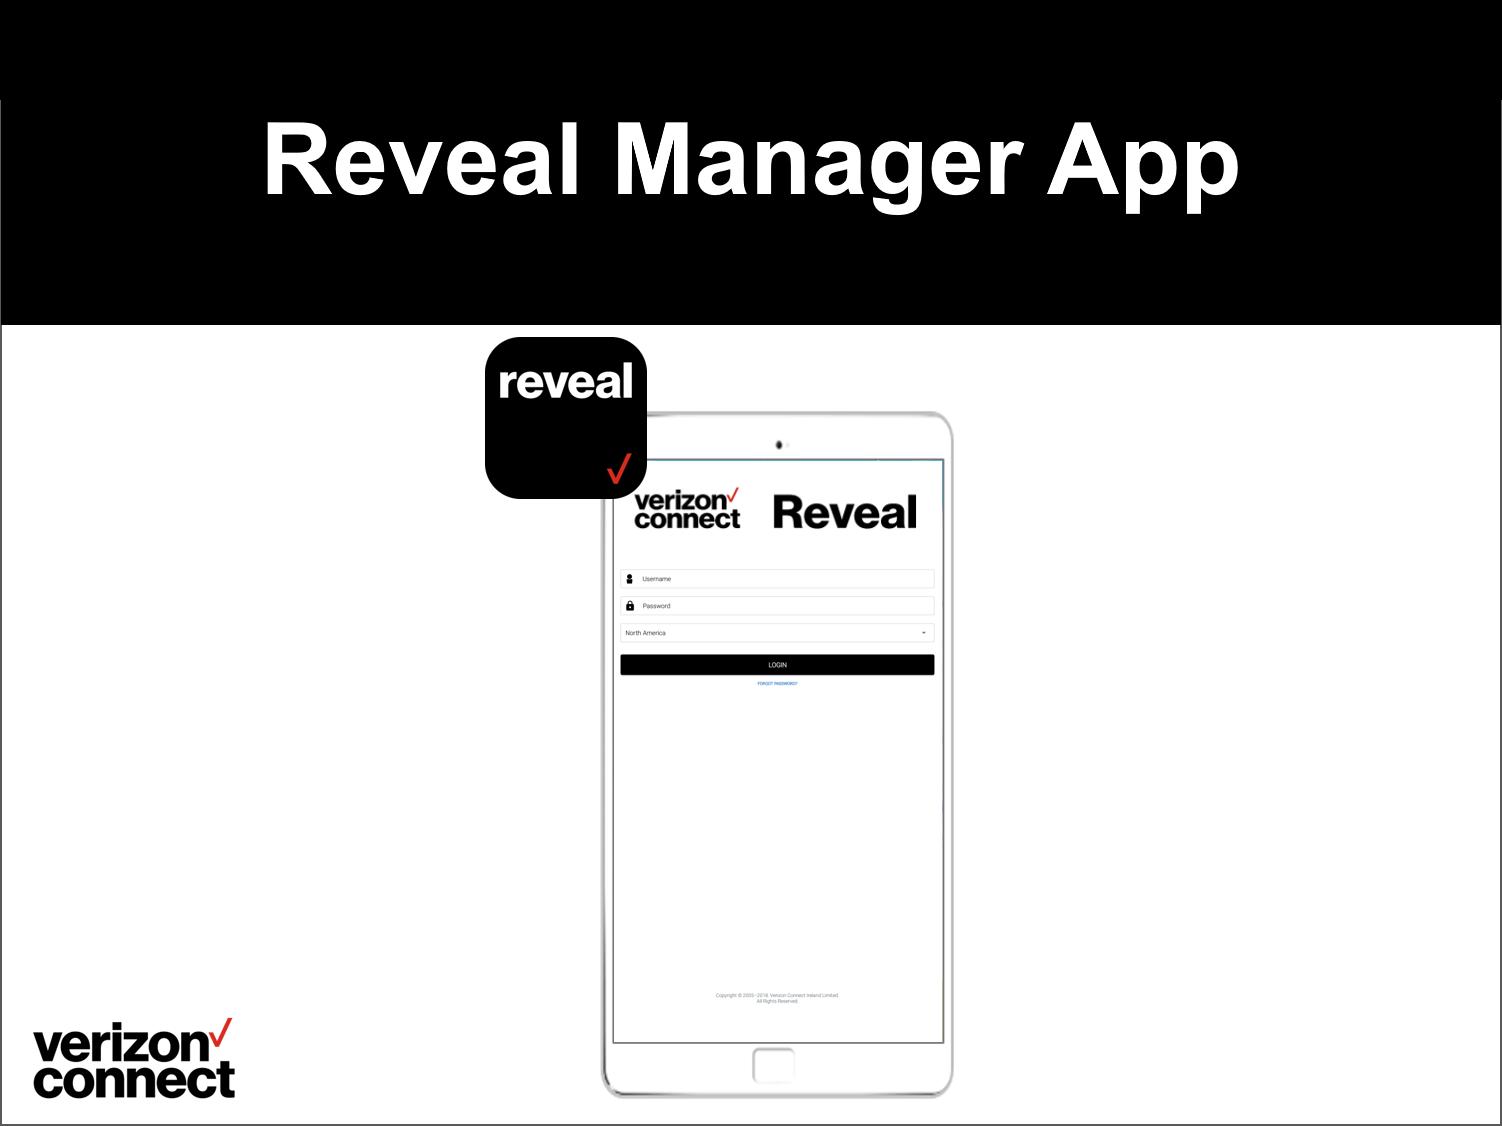 Reveal Manager App eTutorial